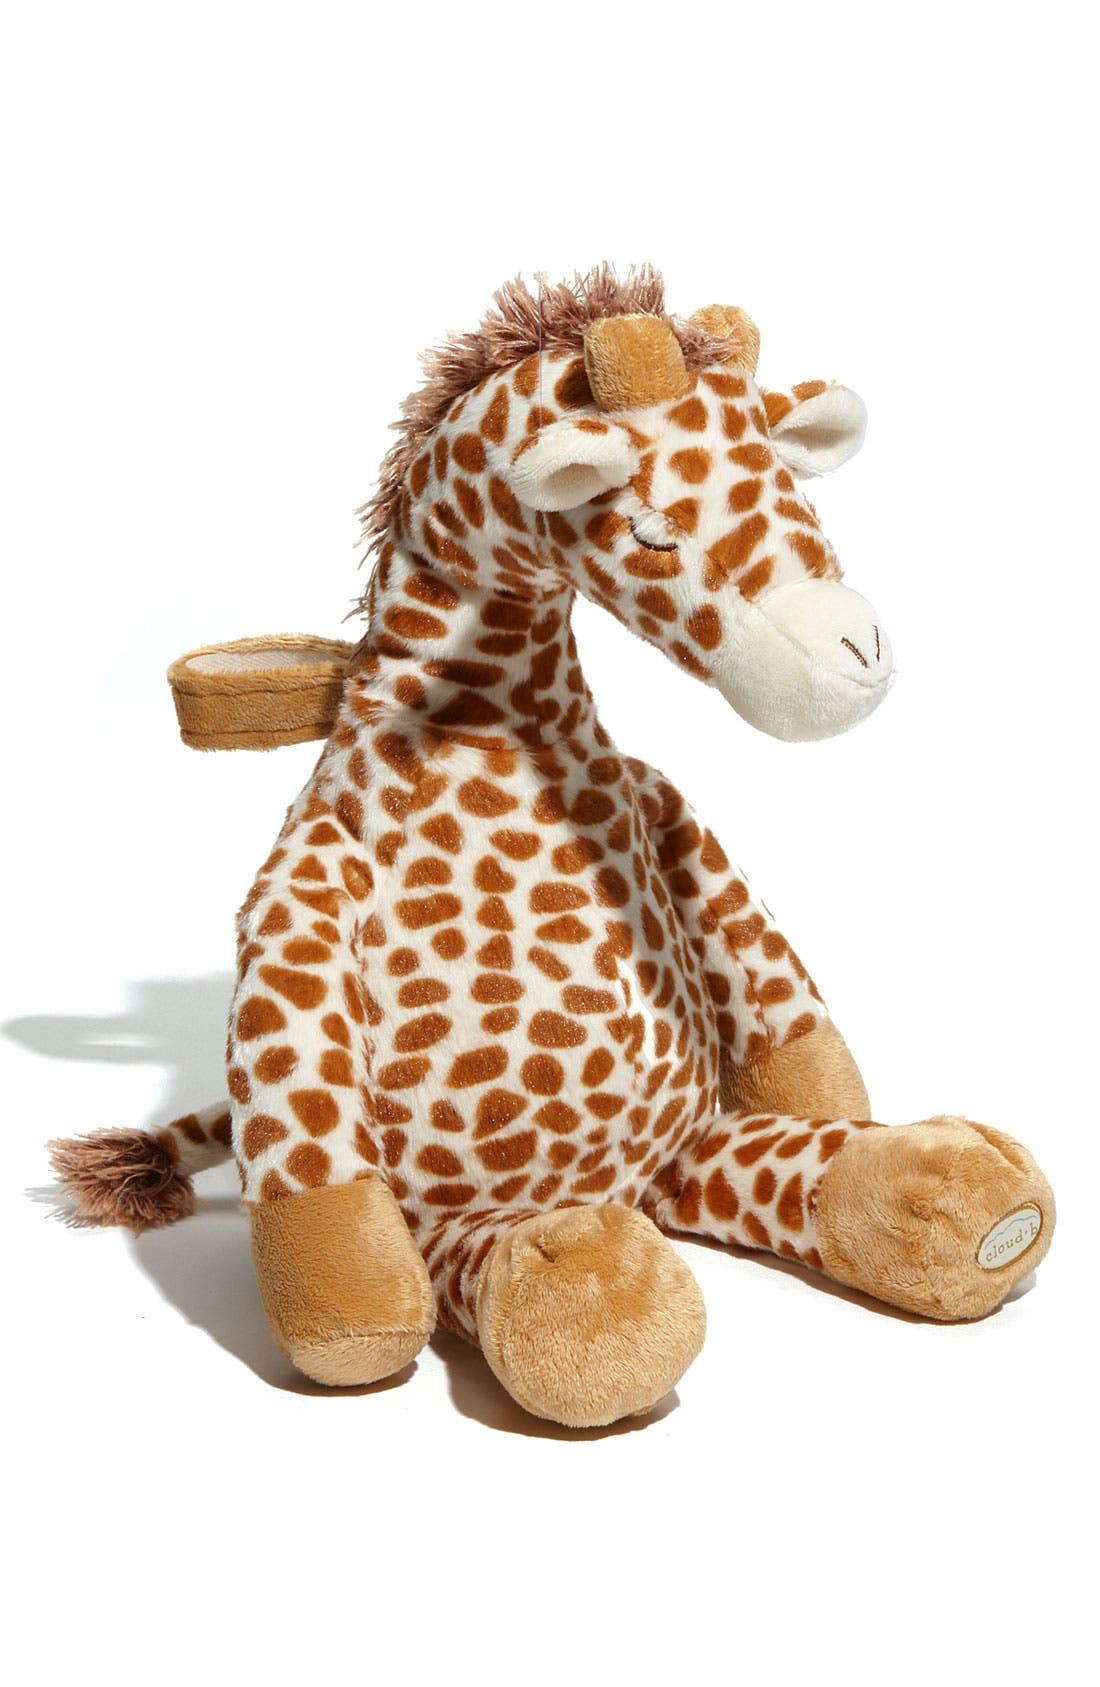 Alternate Image 1 Selected - Cloud B 'Gentle Giraffe' Stuffed Animal